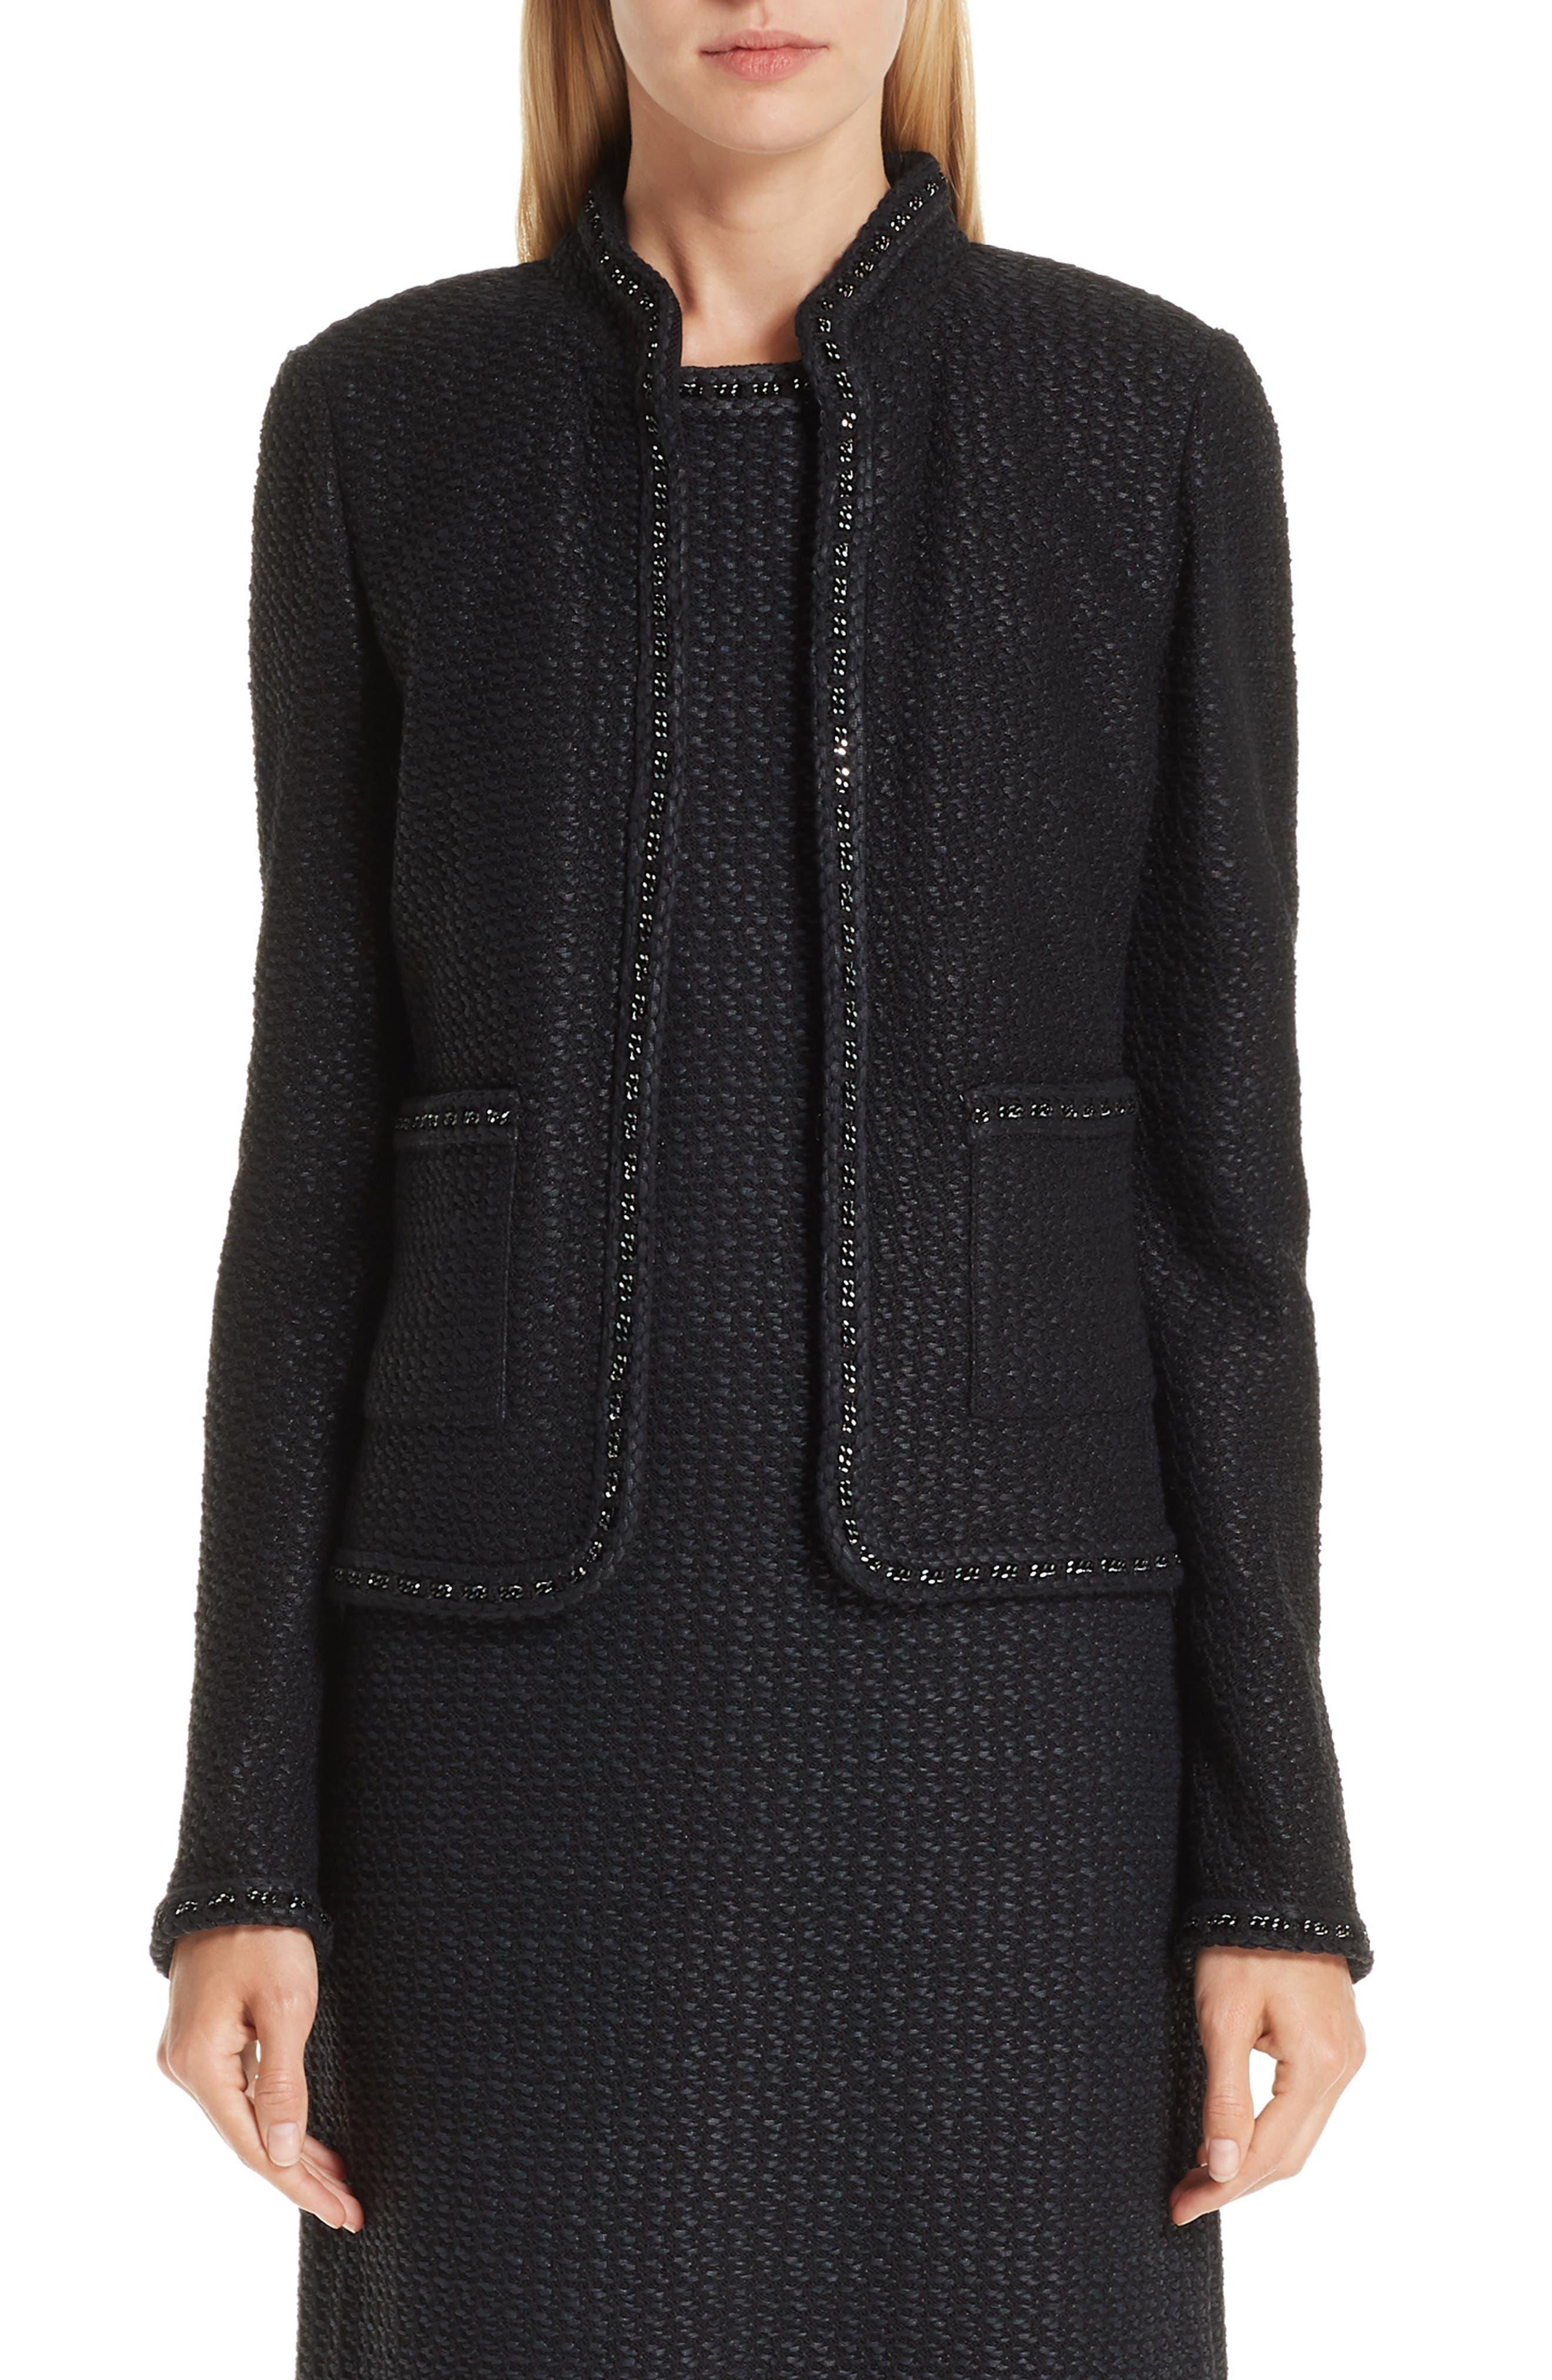 ST. JOHN COLLECTION, Adina Knit Short Jacket, Main thumbnail 1, color, CAVIAR